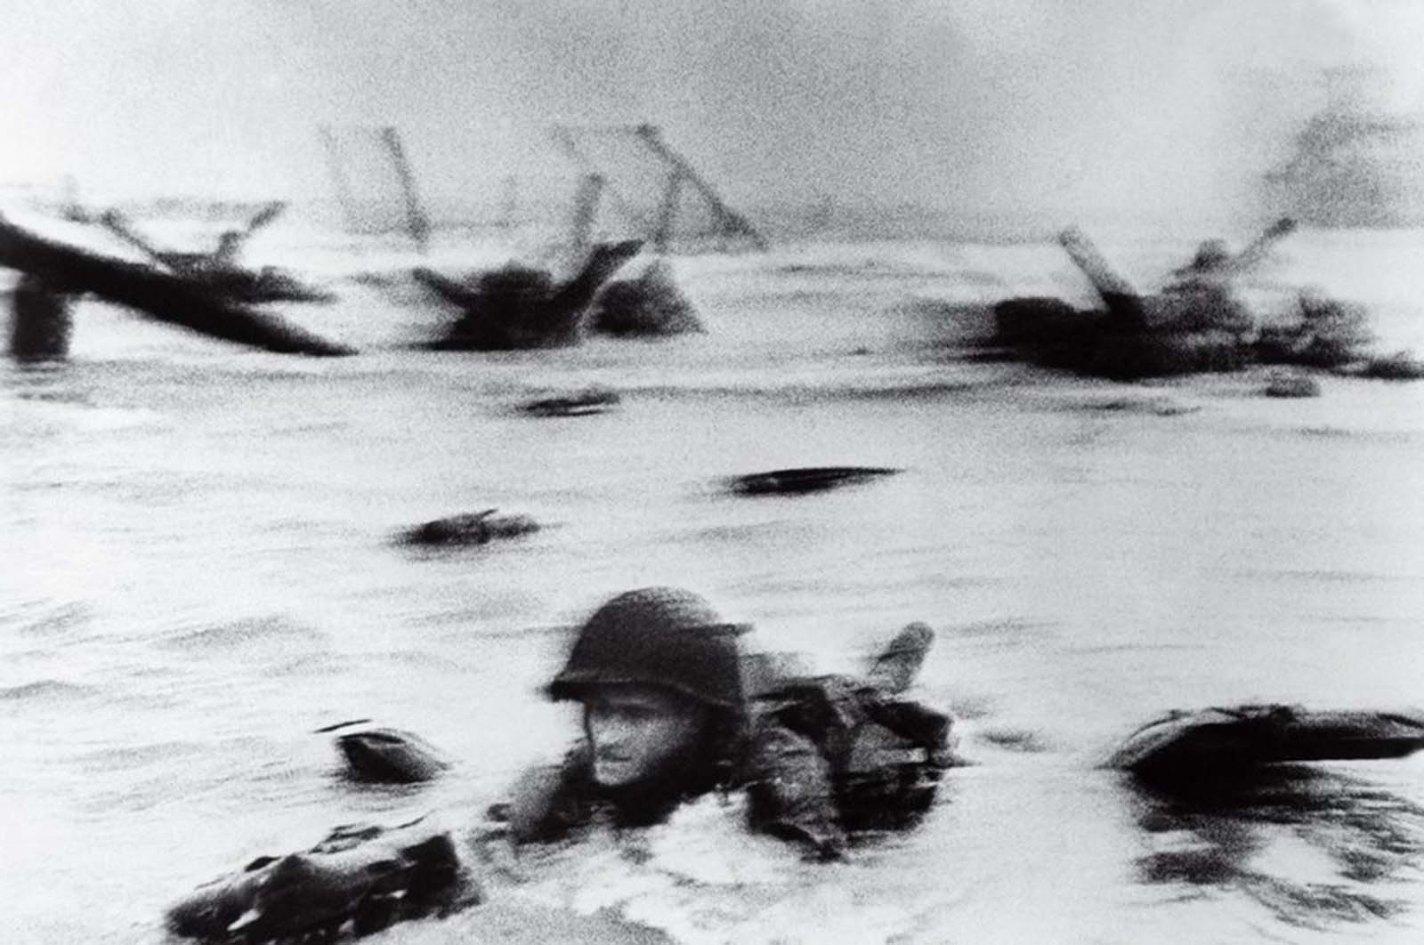 history photo D-Day, Robert Capa, 1944